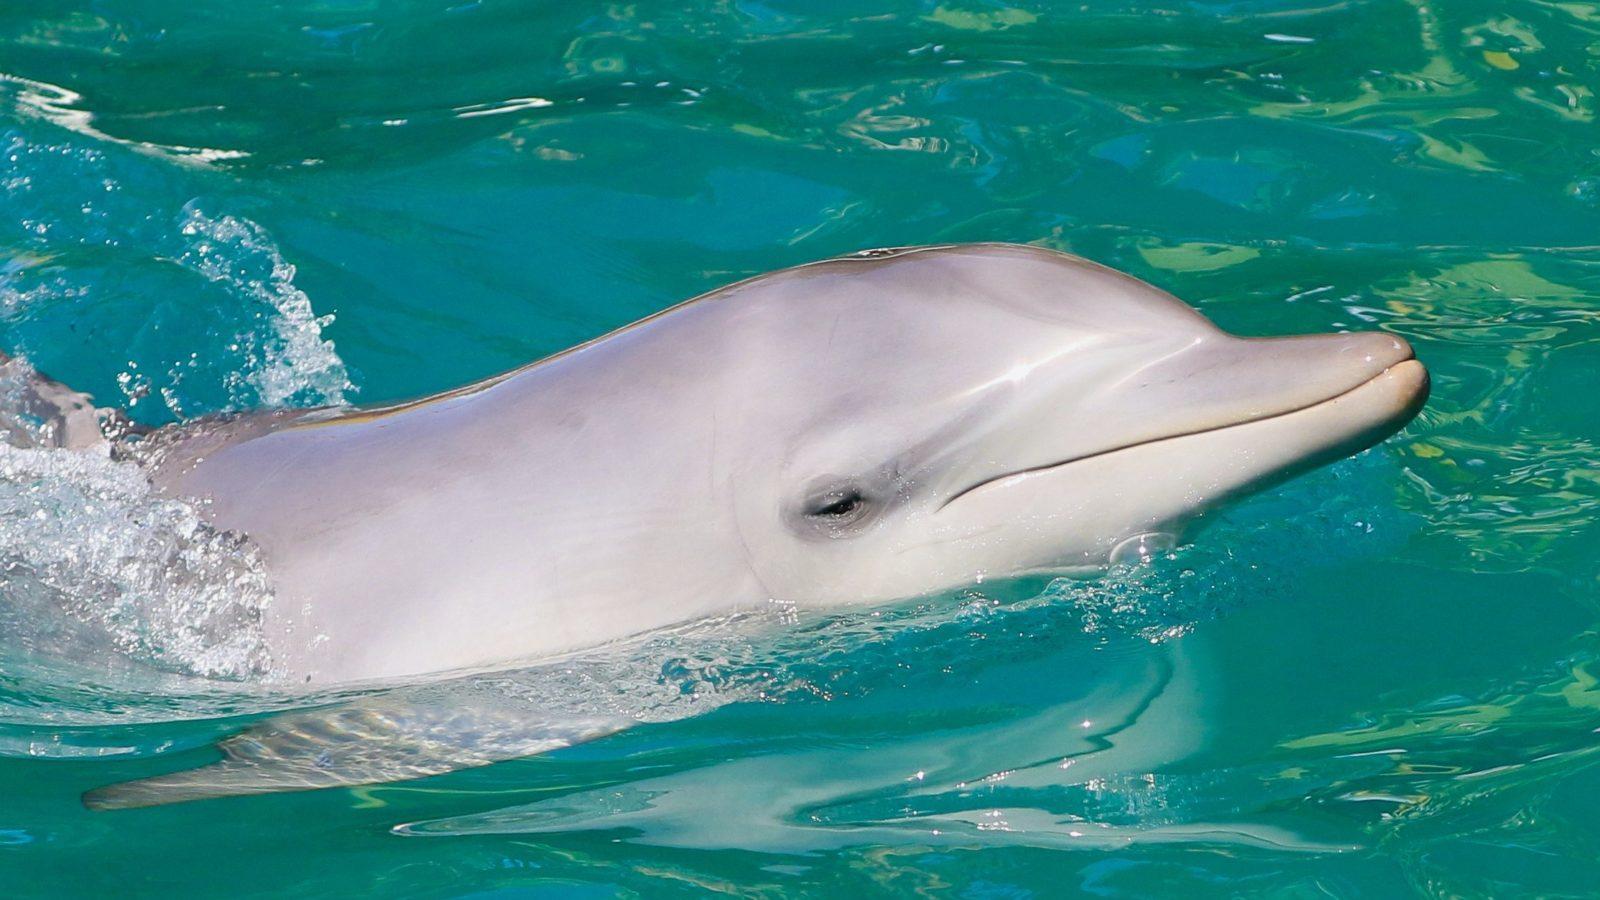 Moonshadow TQC dolphin